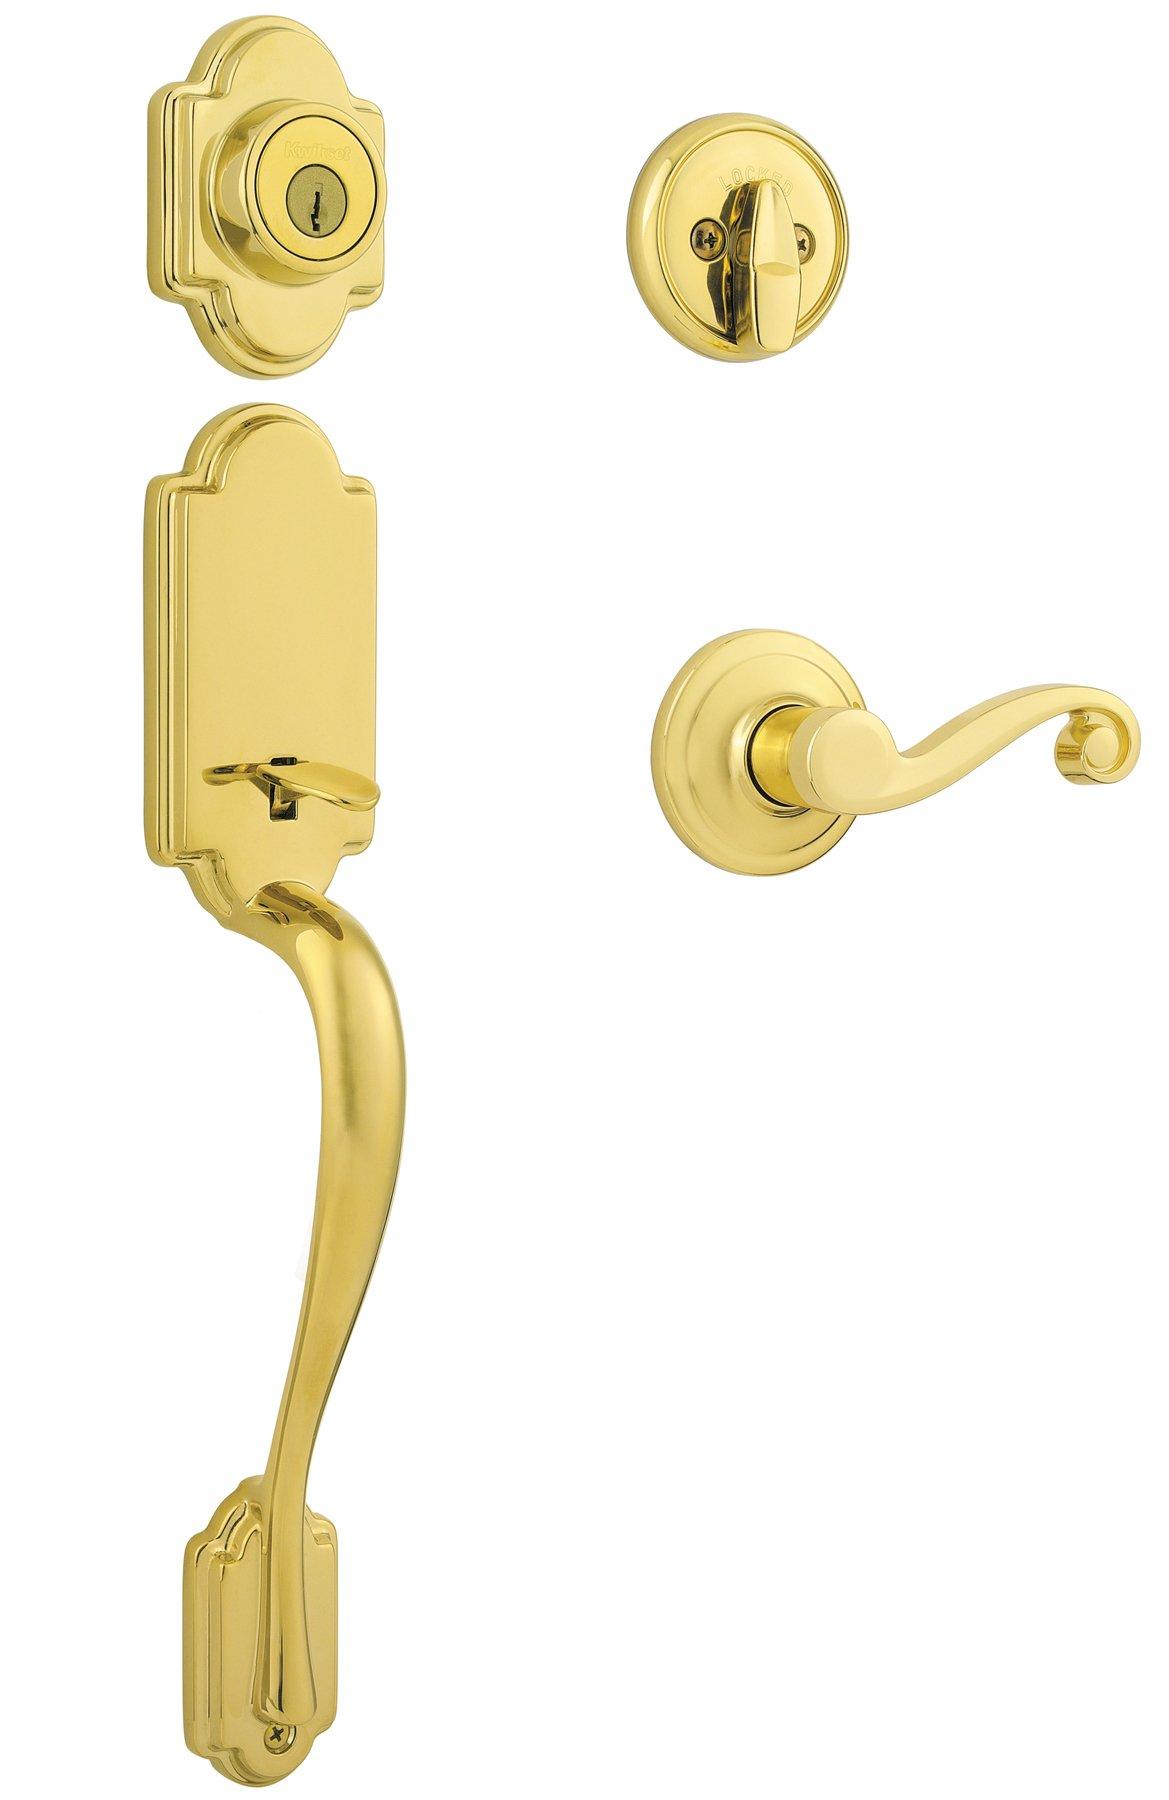 Kwikset Arlington Single Cylinder Handleset w/Lido Lever featuring SmartKey in Lifetime Polished Brass